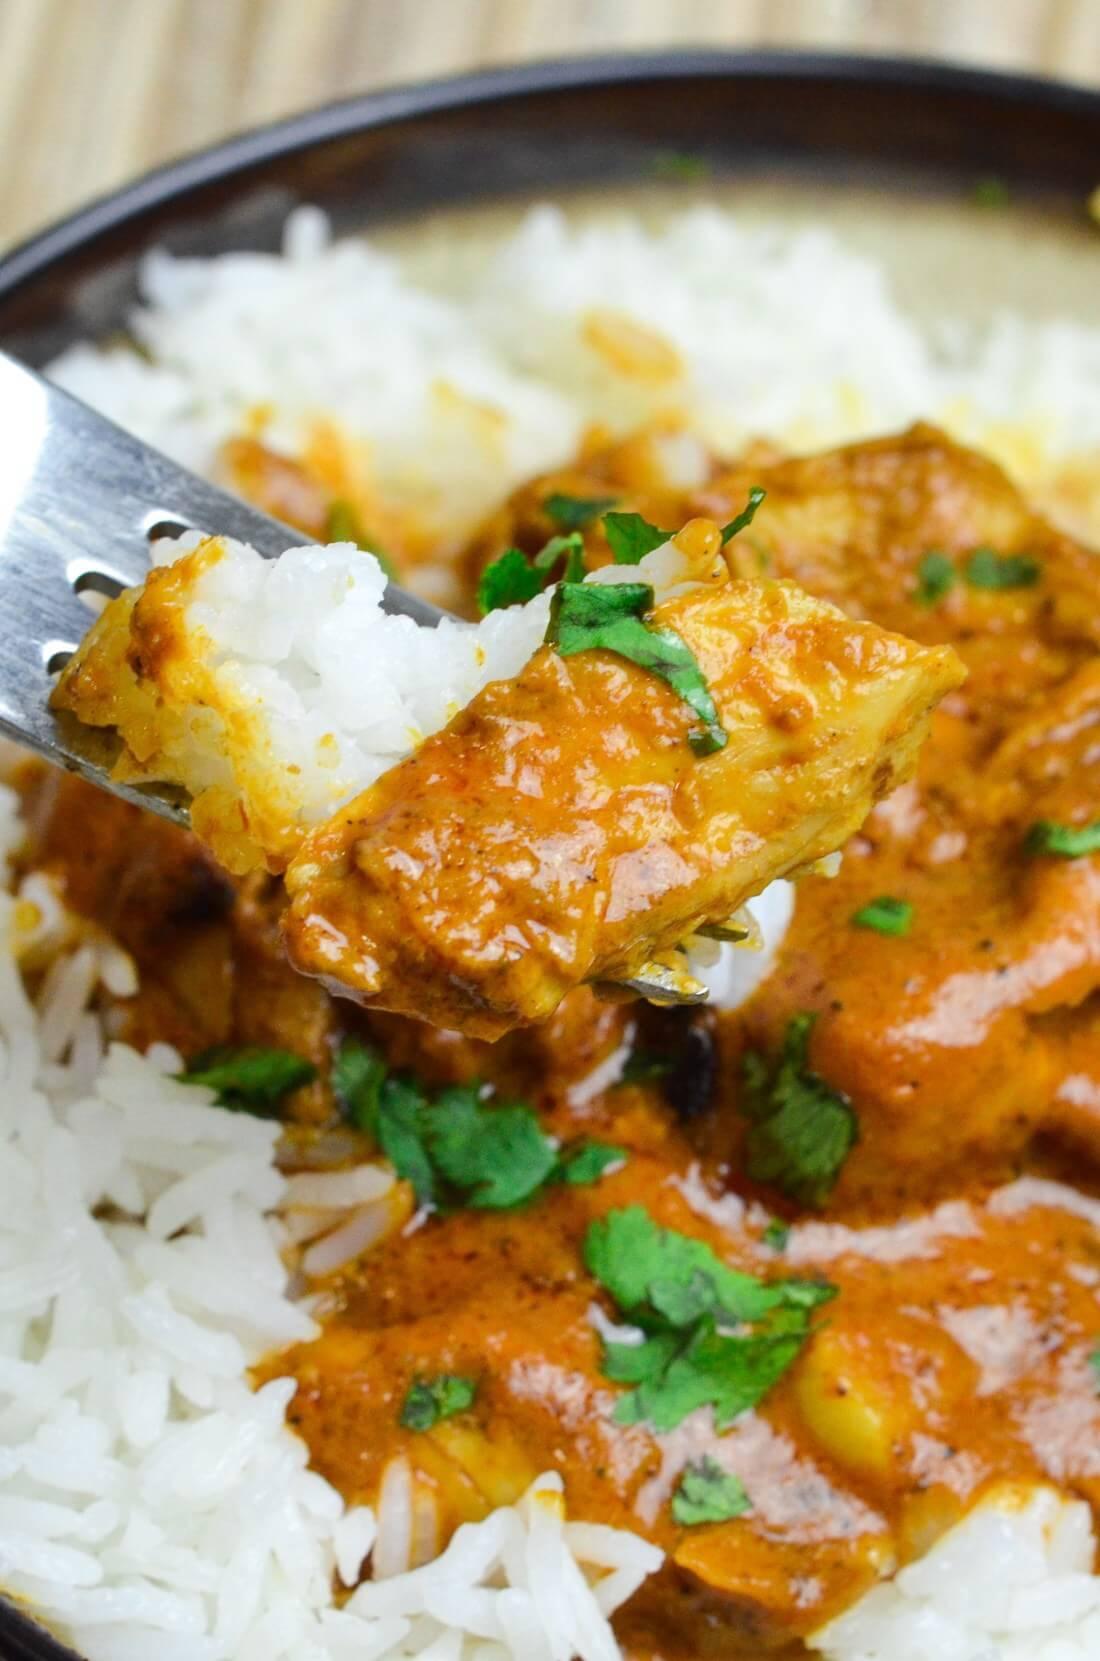 20.Pressure Cooker Indian Butter Chicken